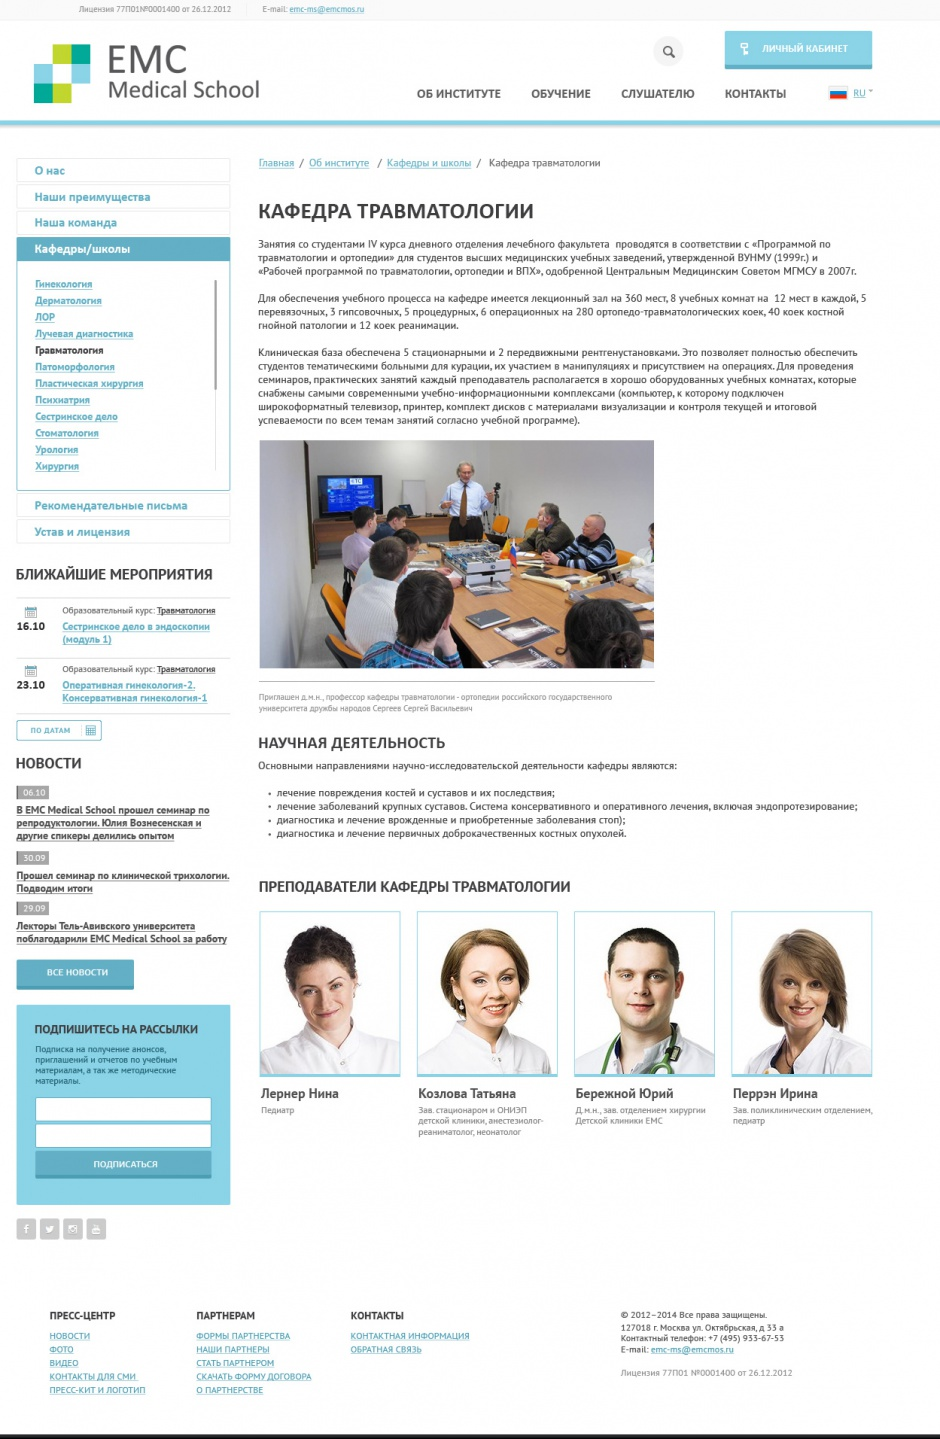 EMC Medical School